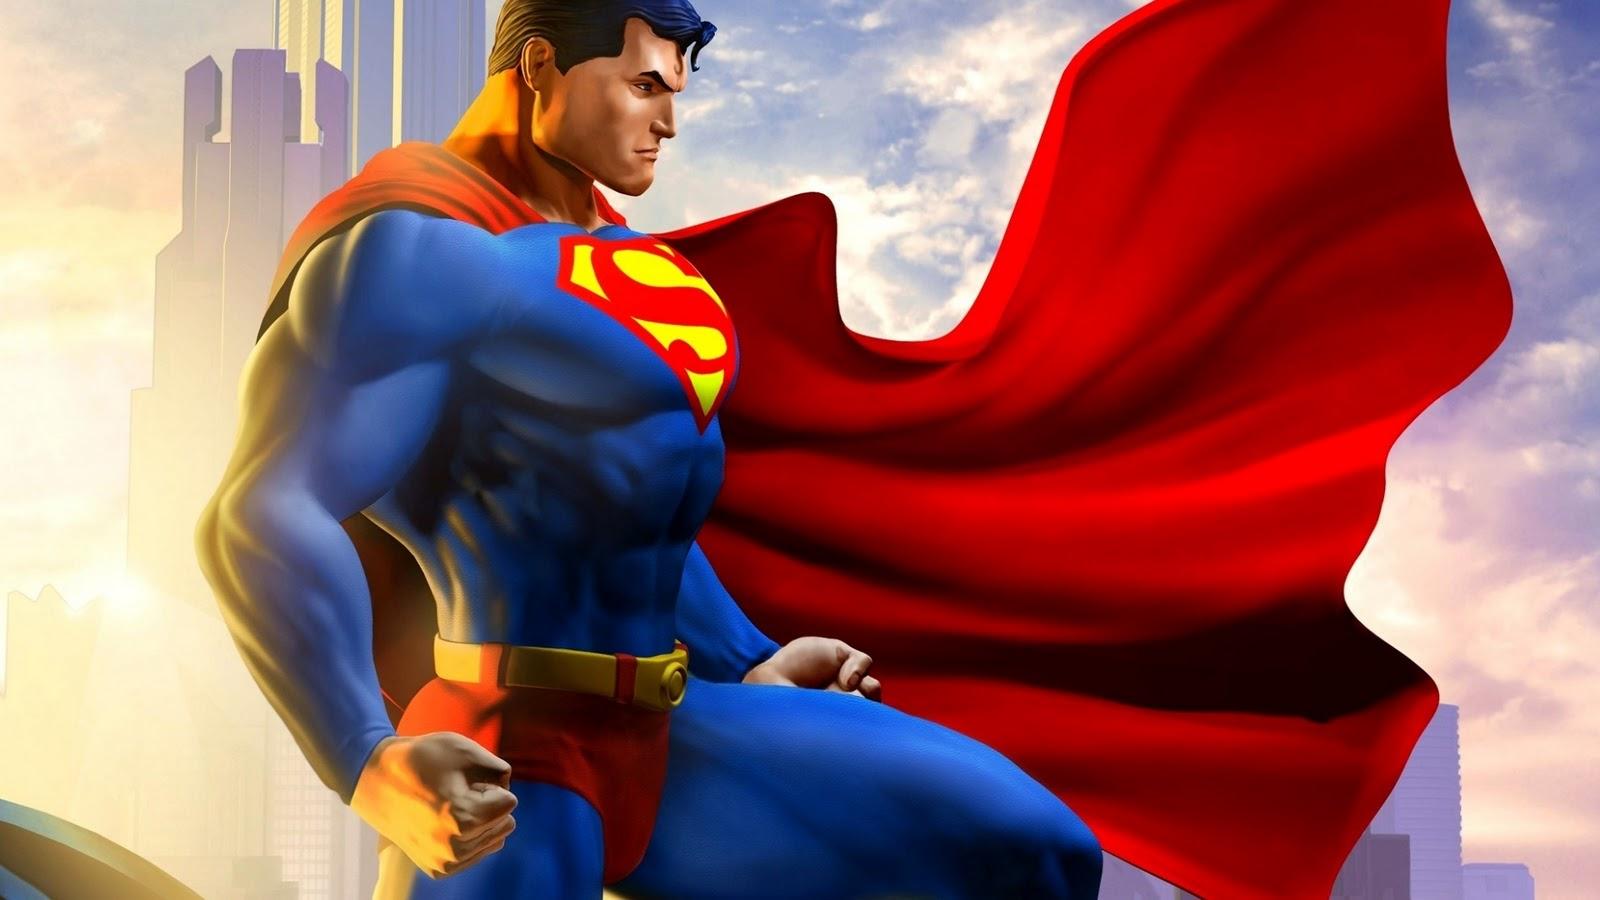 superman wallpaper hdsuperman desktop wallpapersuperman wallpaper 1600x900